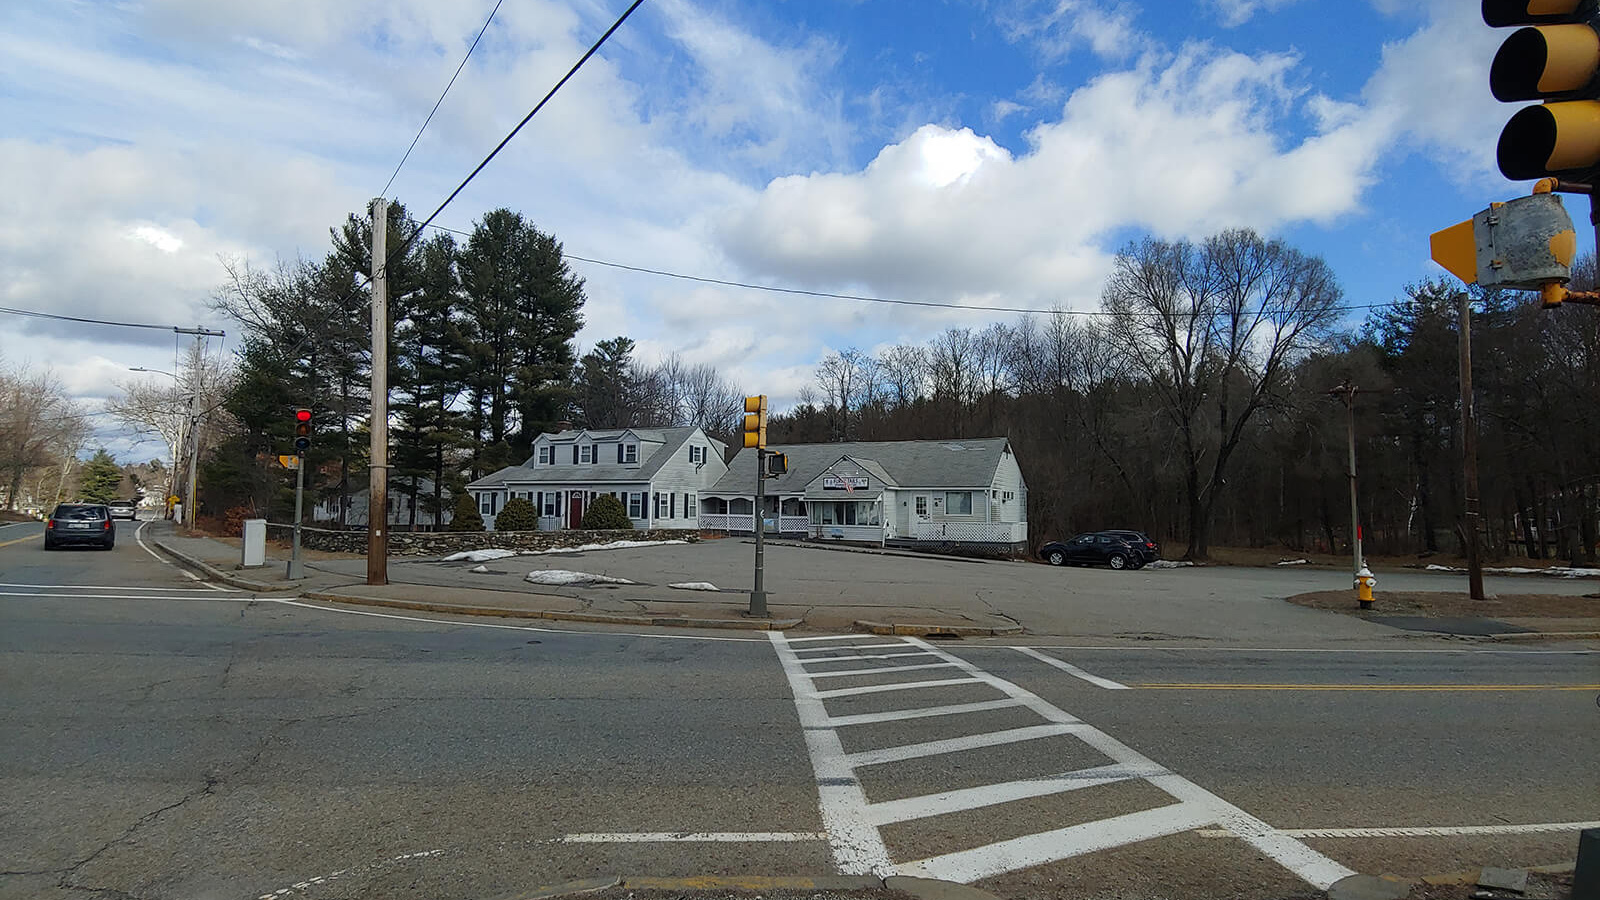 160 Shrewsbury Street, Holden, Massachusetts 01520, Other,For Sale,Shrewsbury Street,1318